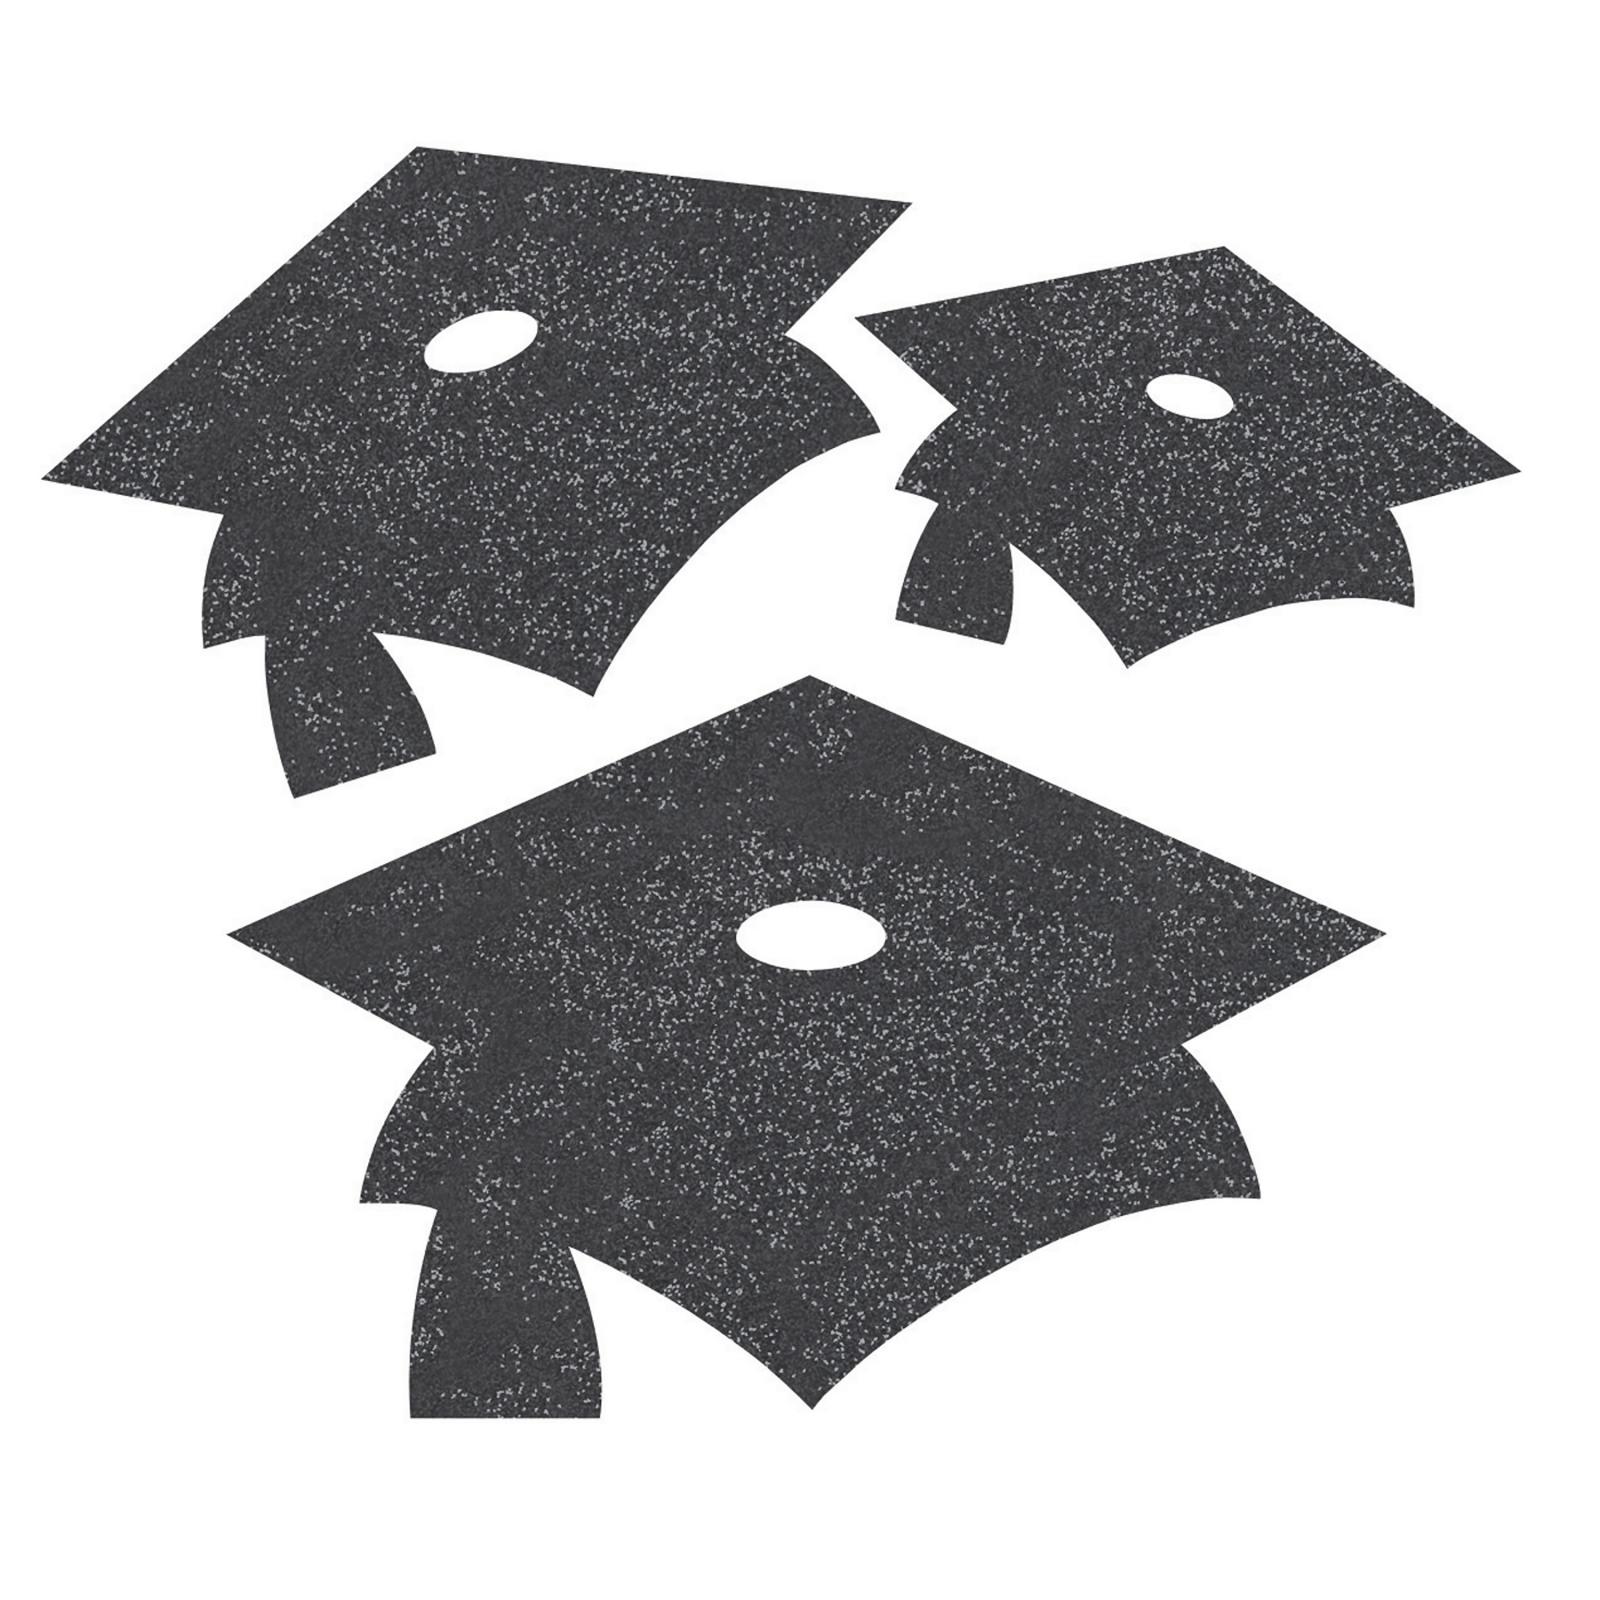 Assorted Black Graduation Hat Large Confetti